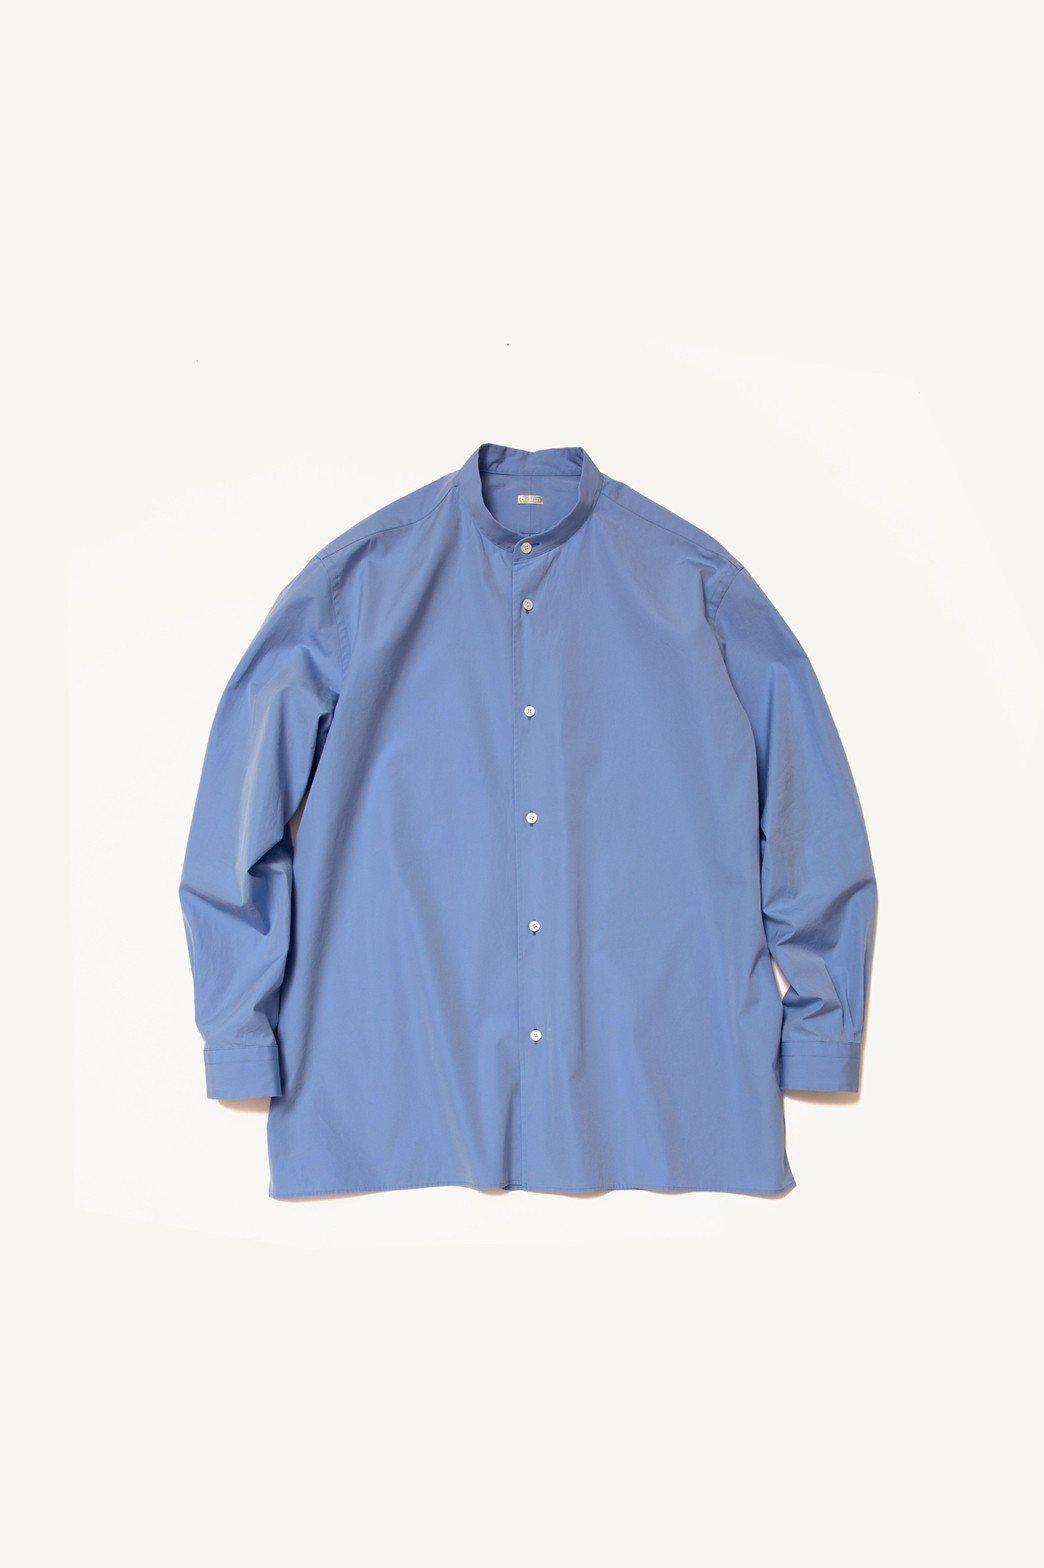 A.PRESSE / Band Collar Shirt